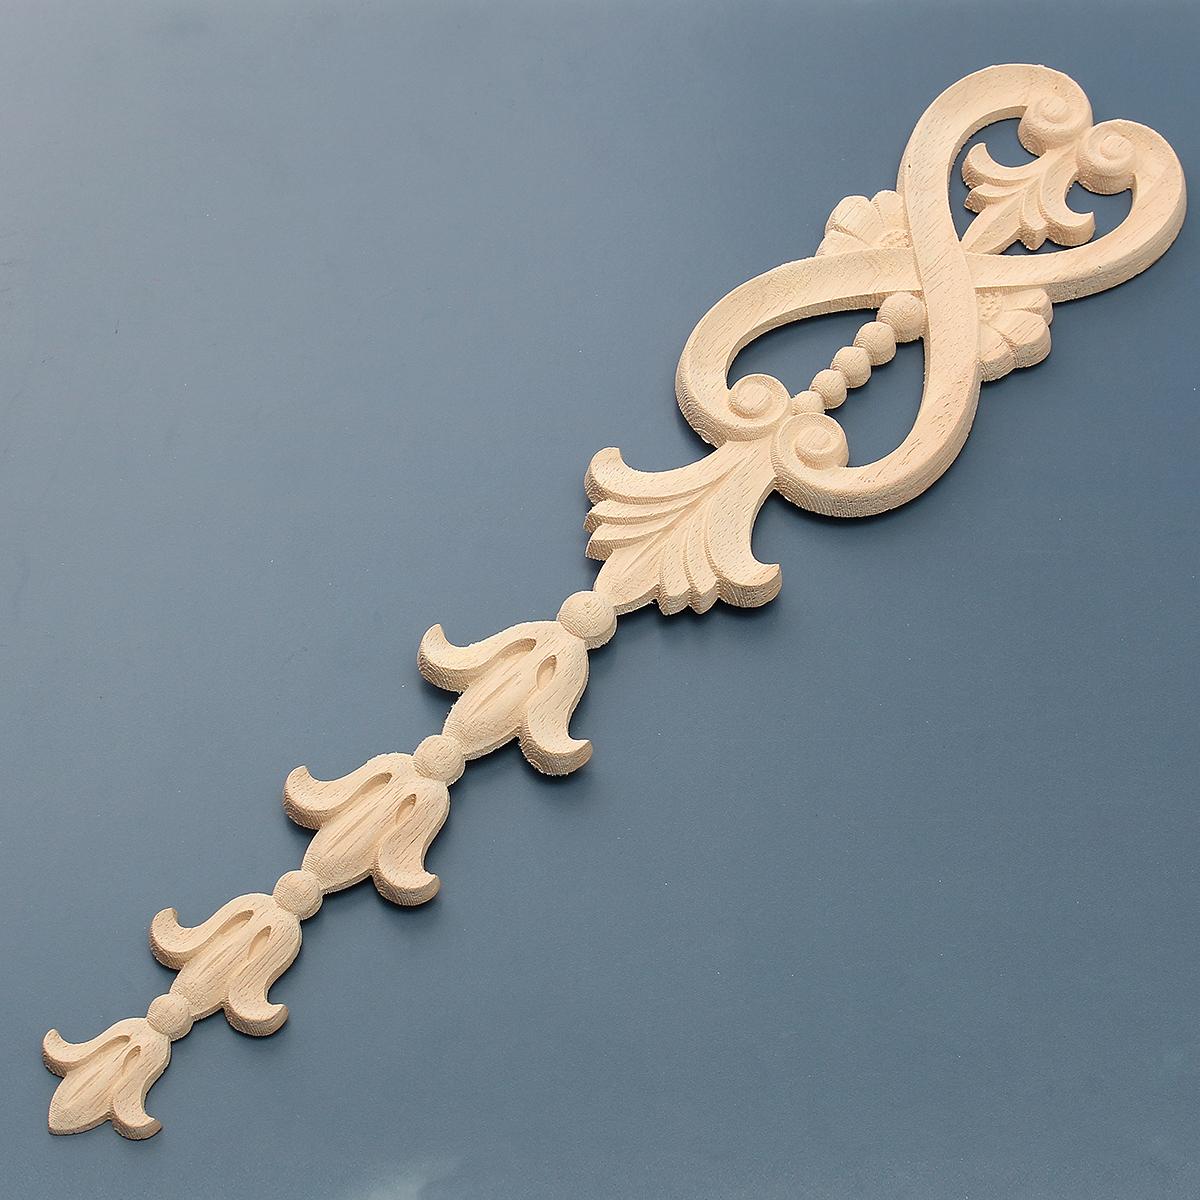 Wood Carving Applique Unpainted Flower Onlay Decal Furniture Cabinet Door Decor 36x7cm